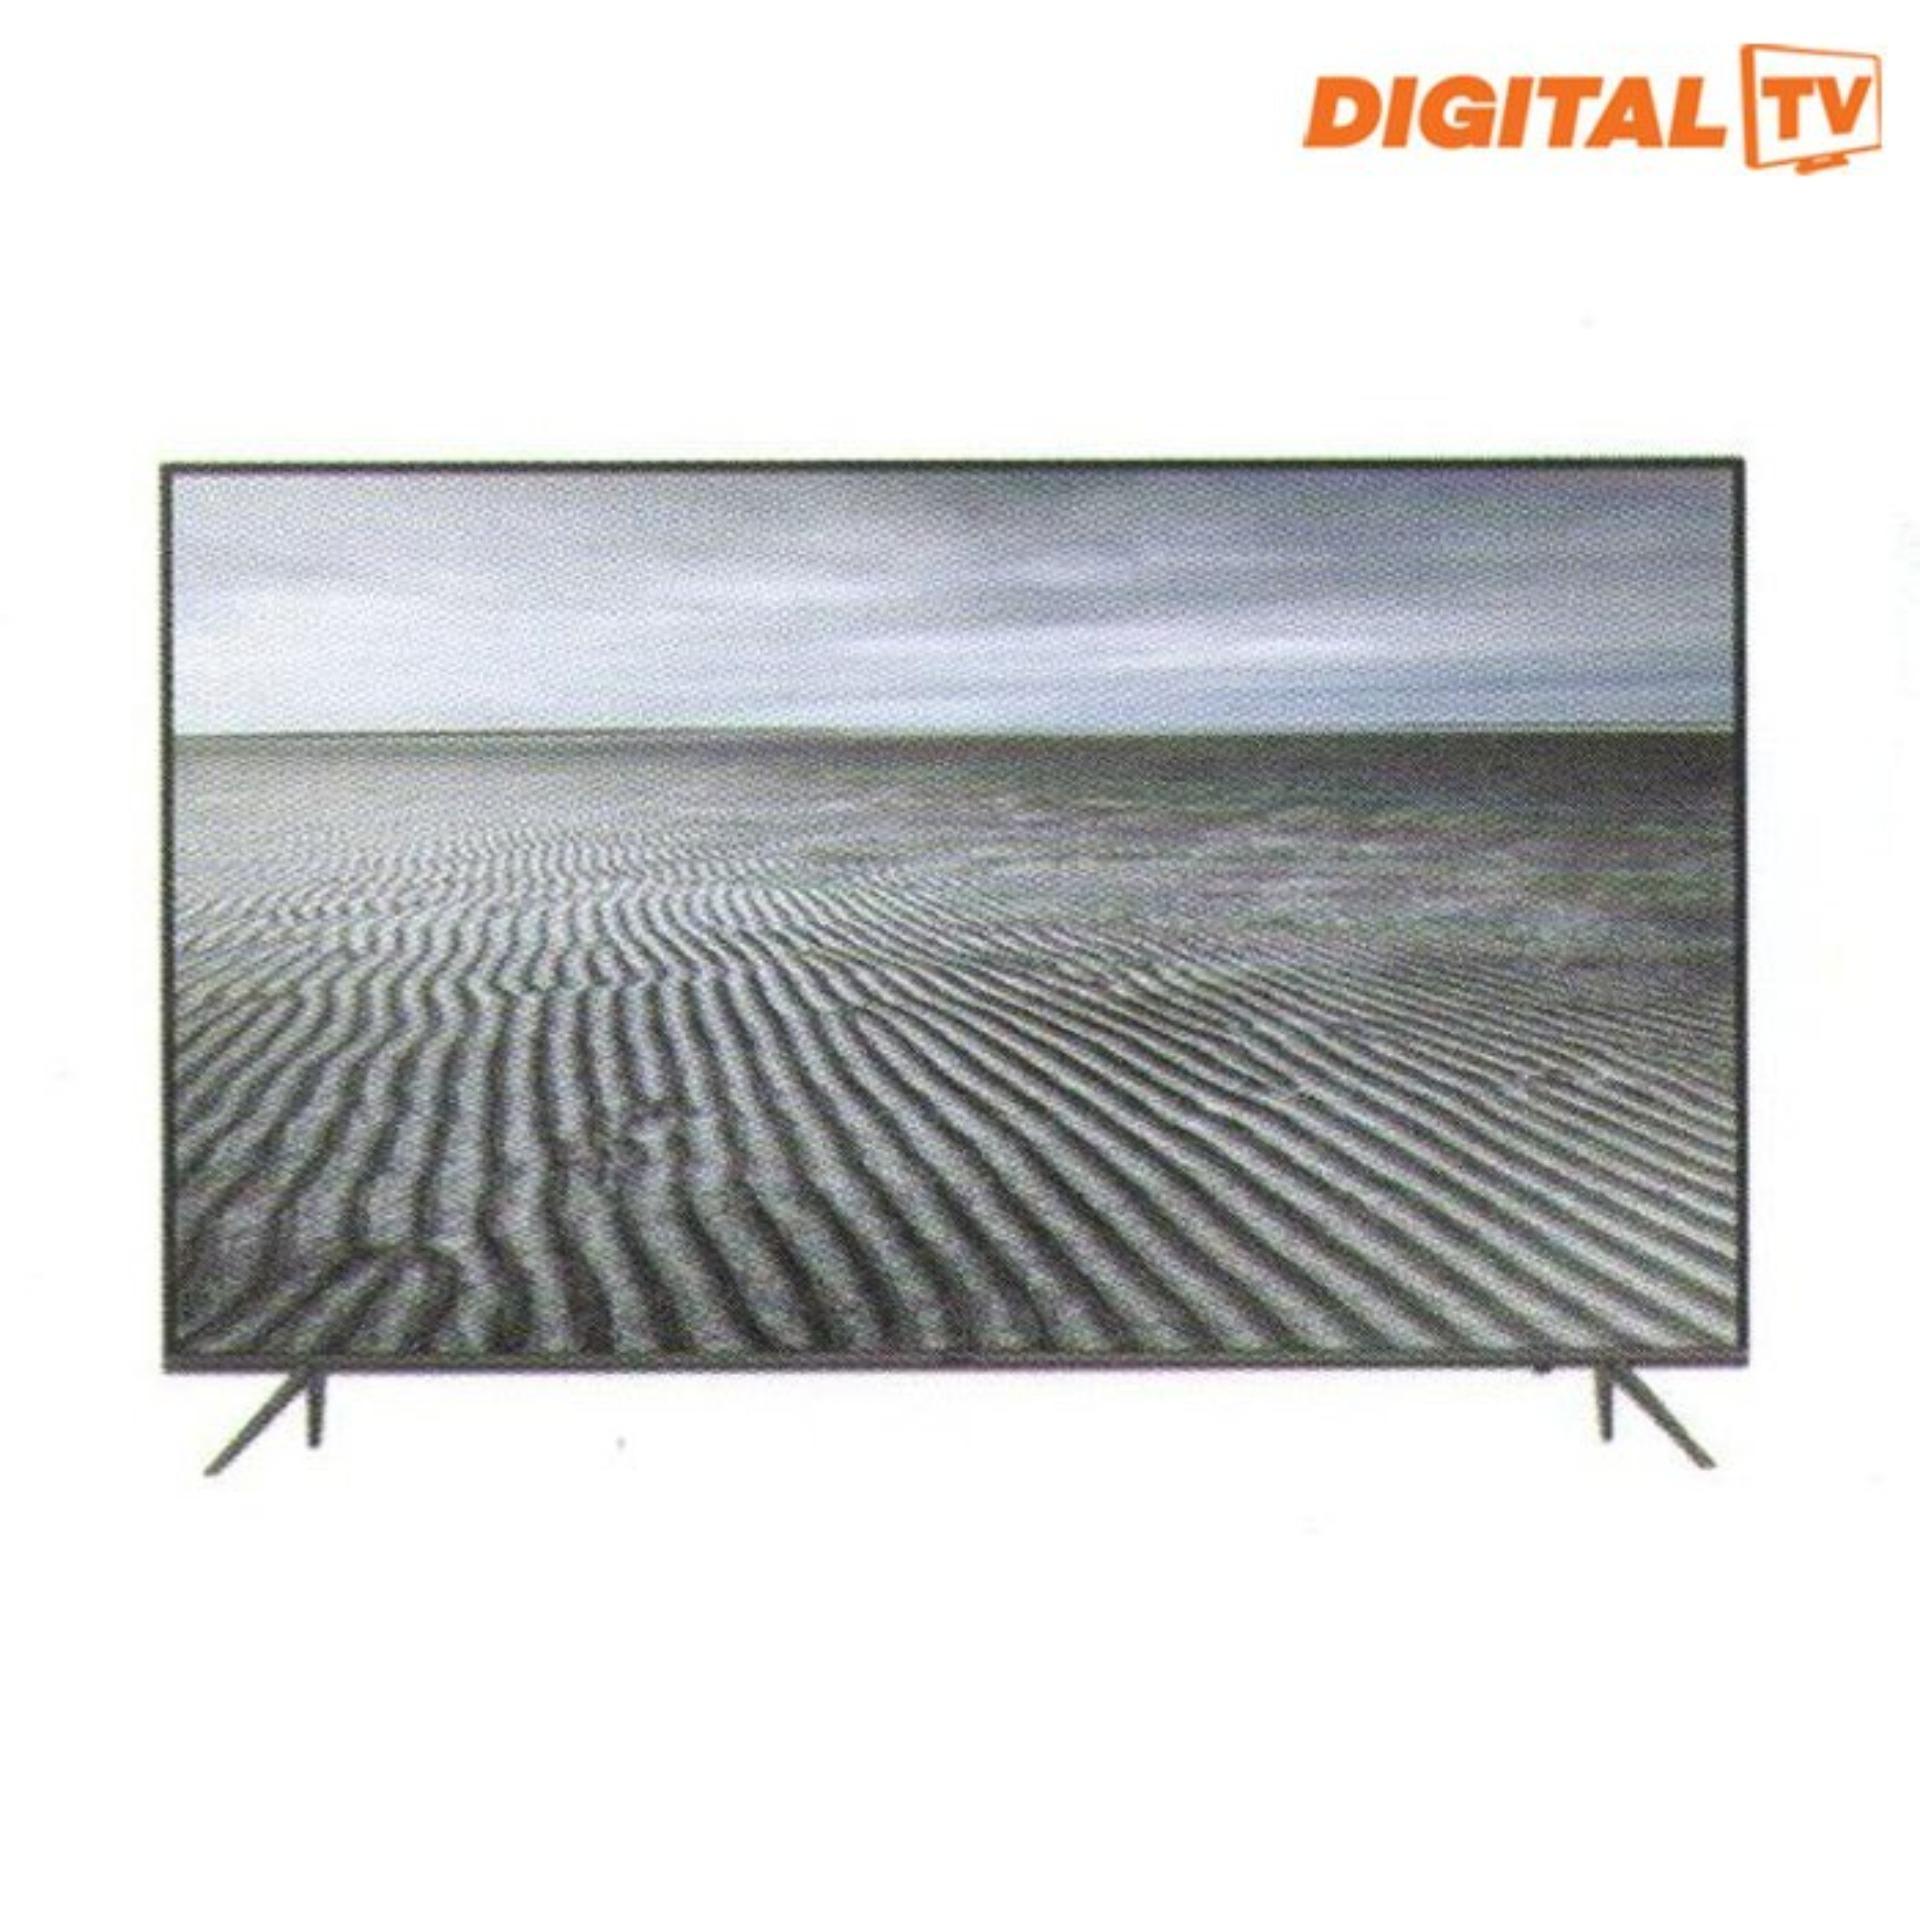 Samsung 43 inch LED Digital Full HD TV - Hitam (Model UA43K5005)